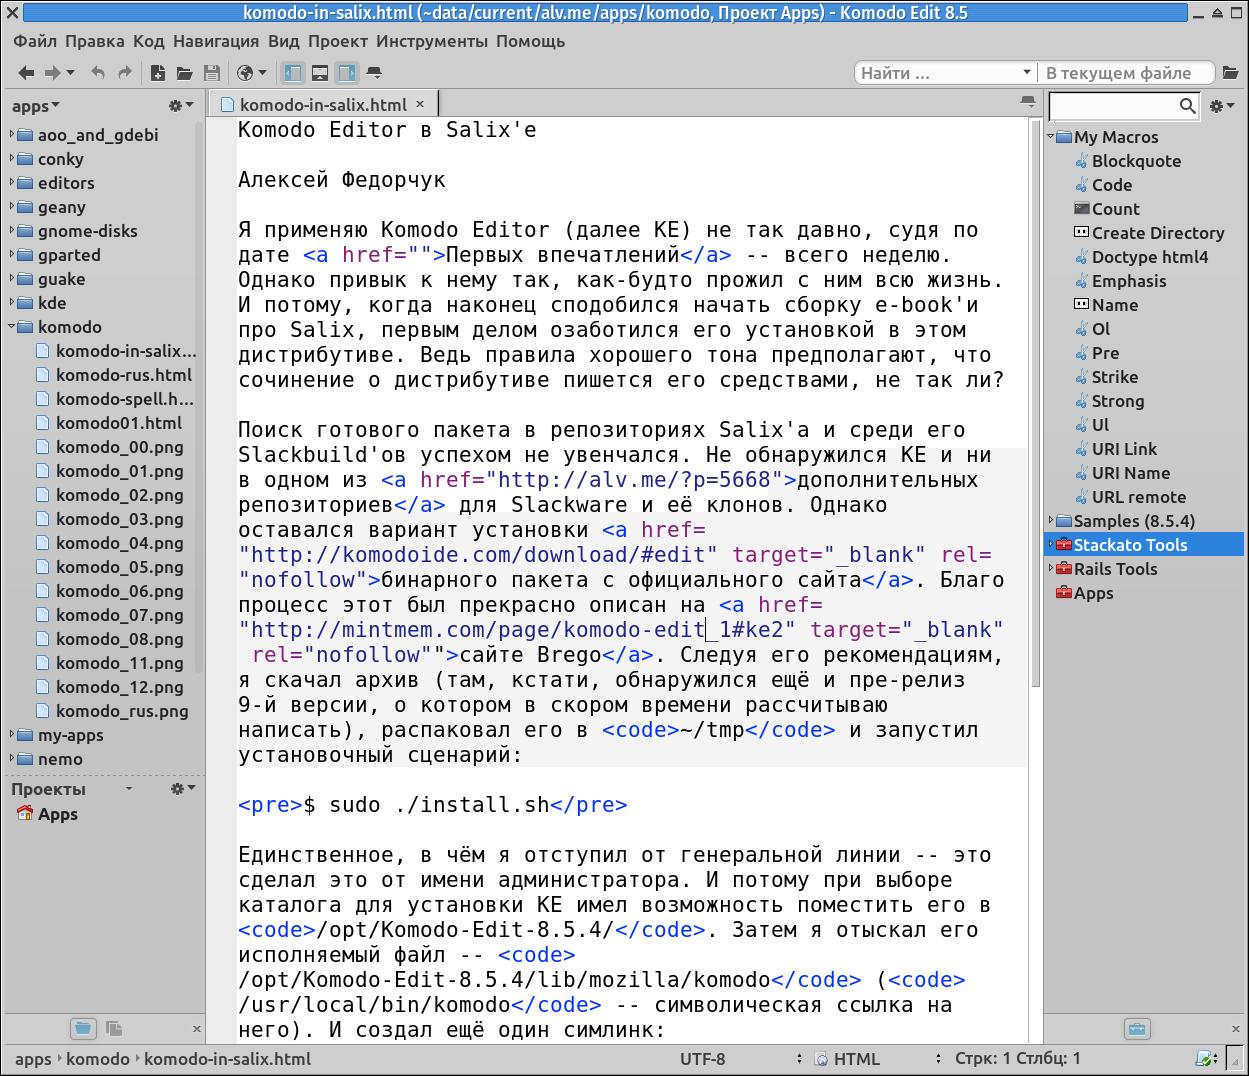 Komodo Editor в Salix'е